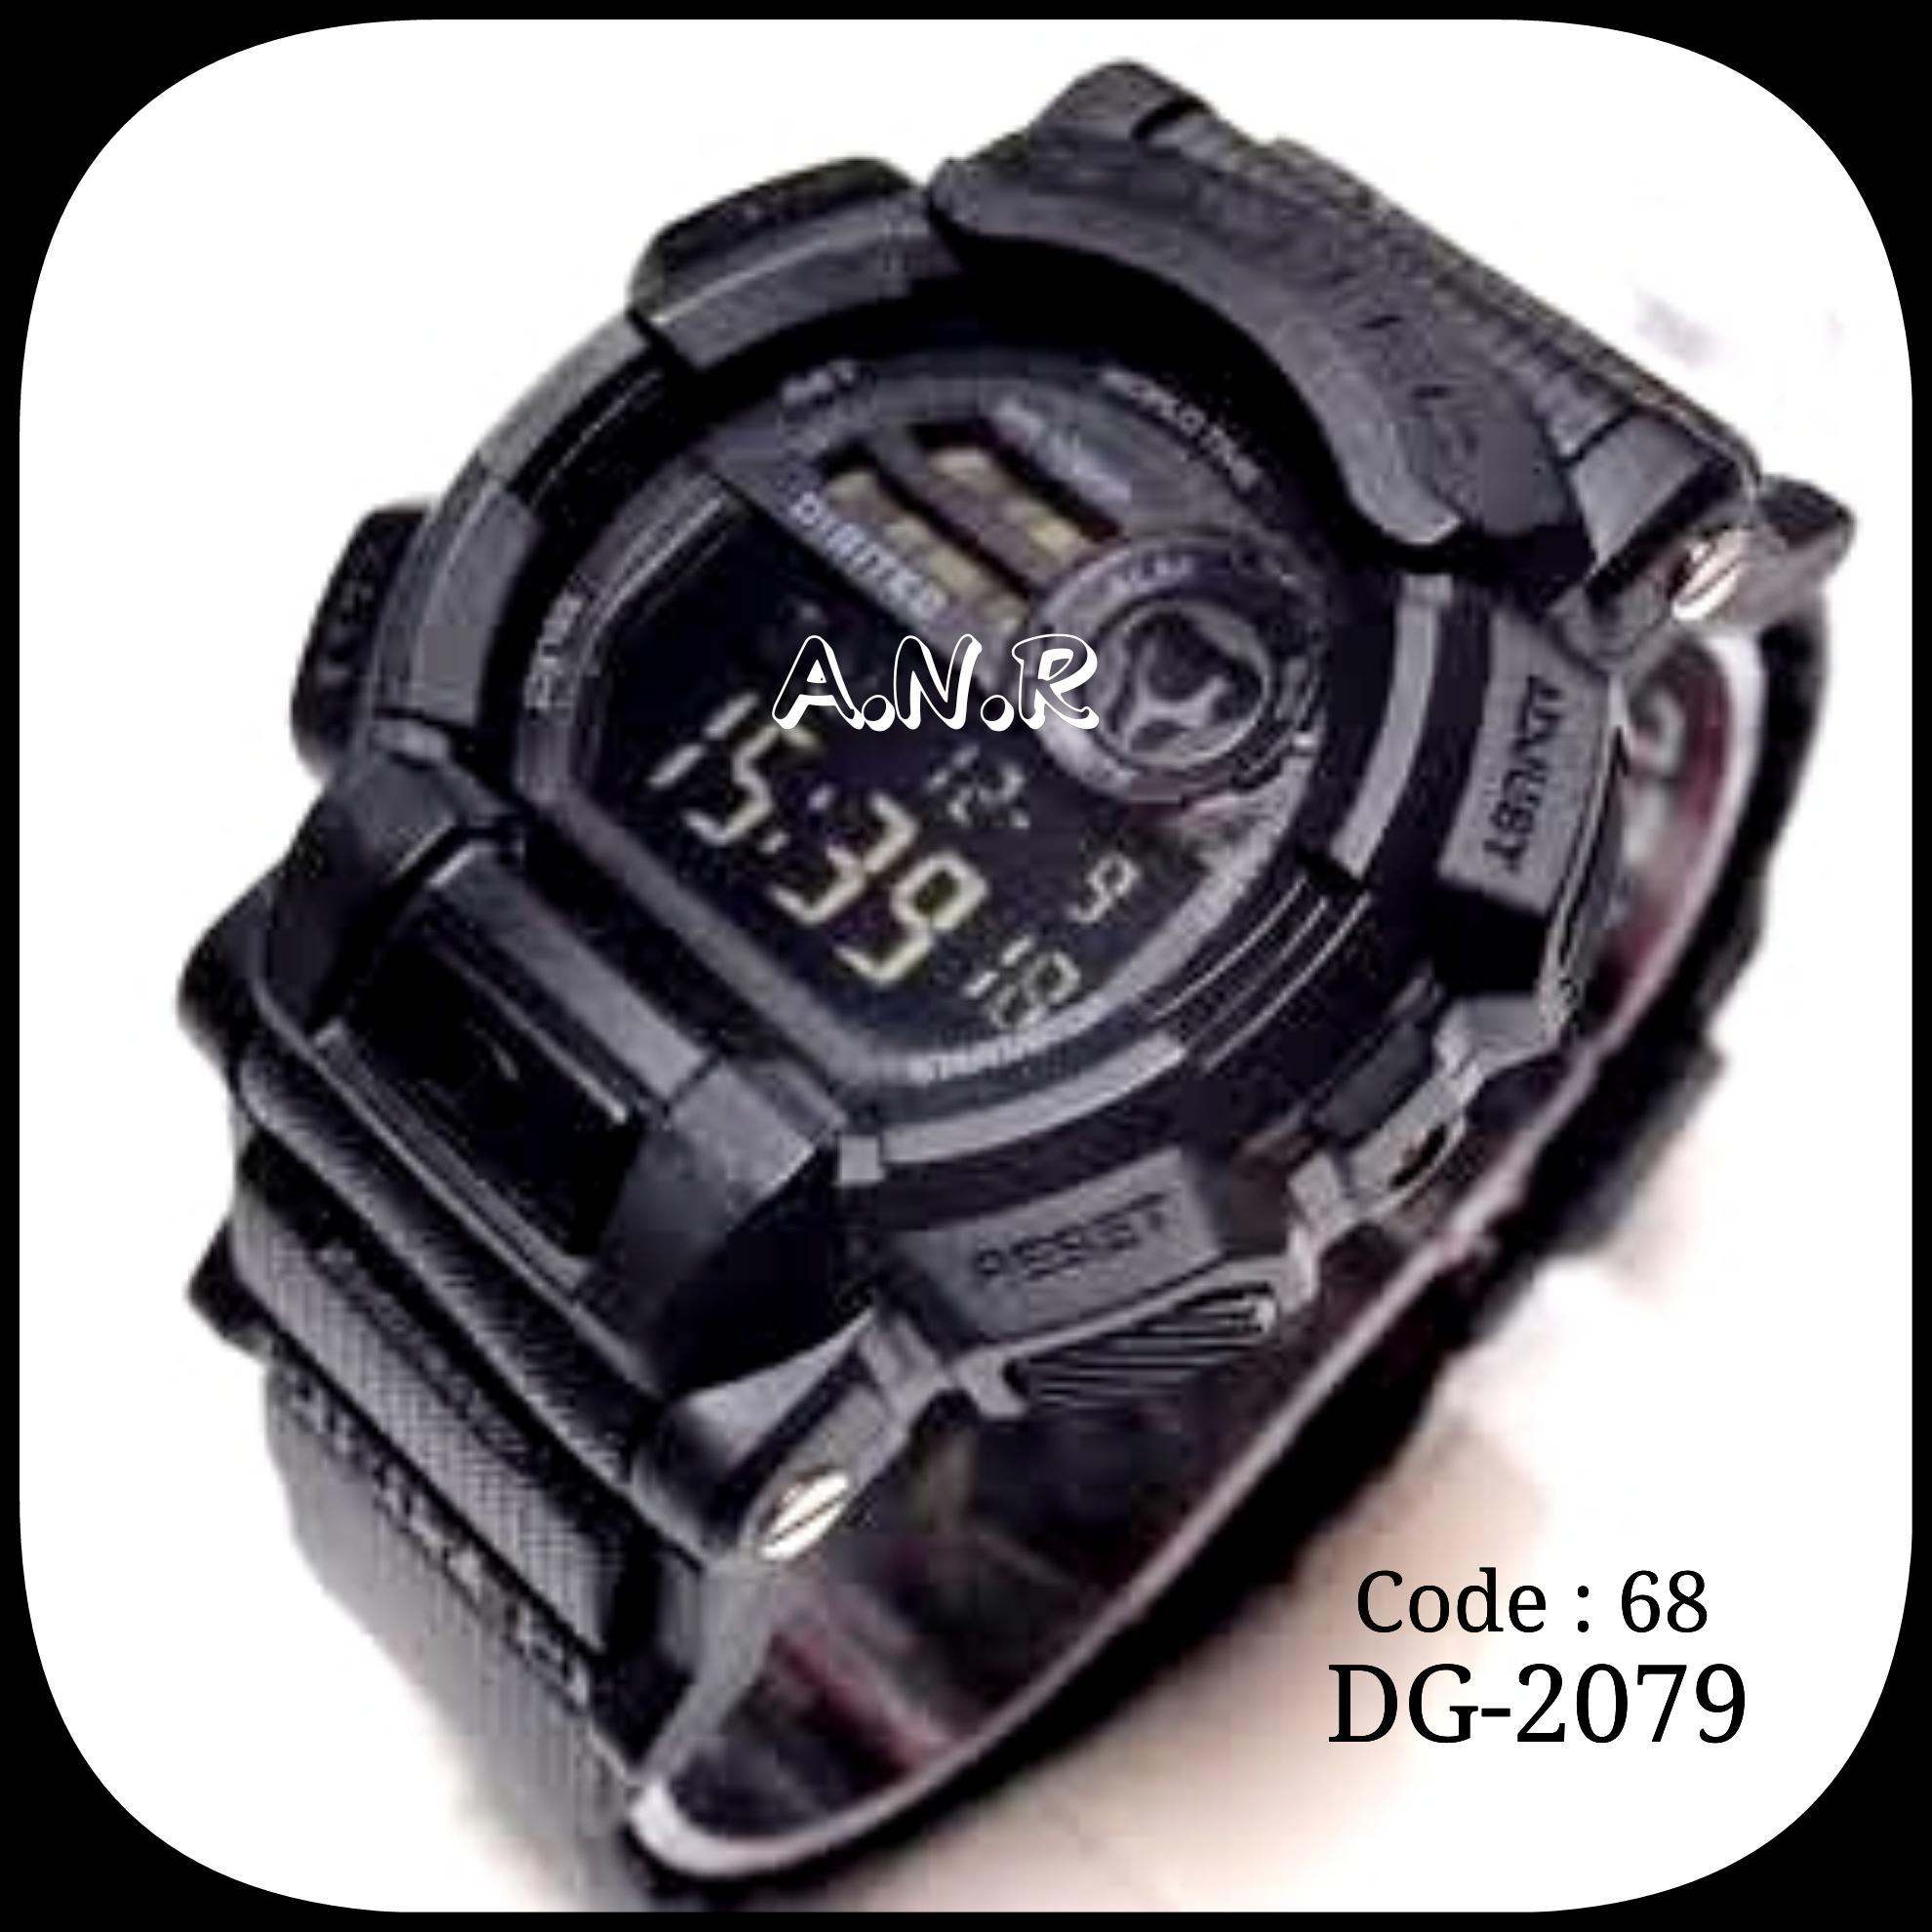 ... Tali Jam Tangan Digitec 2079 DG-2079 DG2079 DG 2079 Super - 3